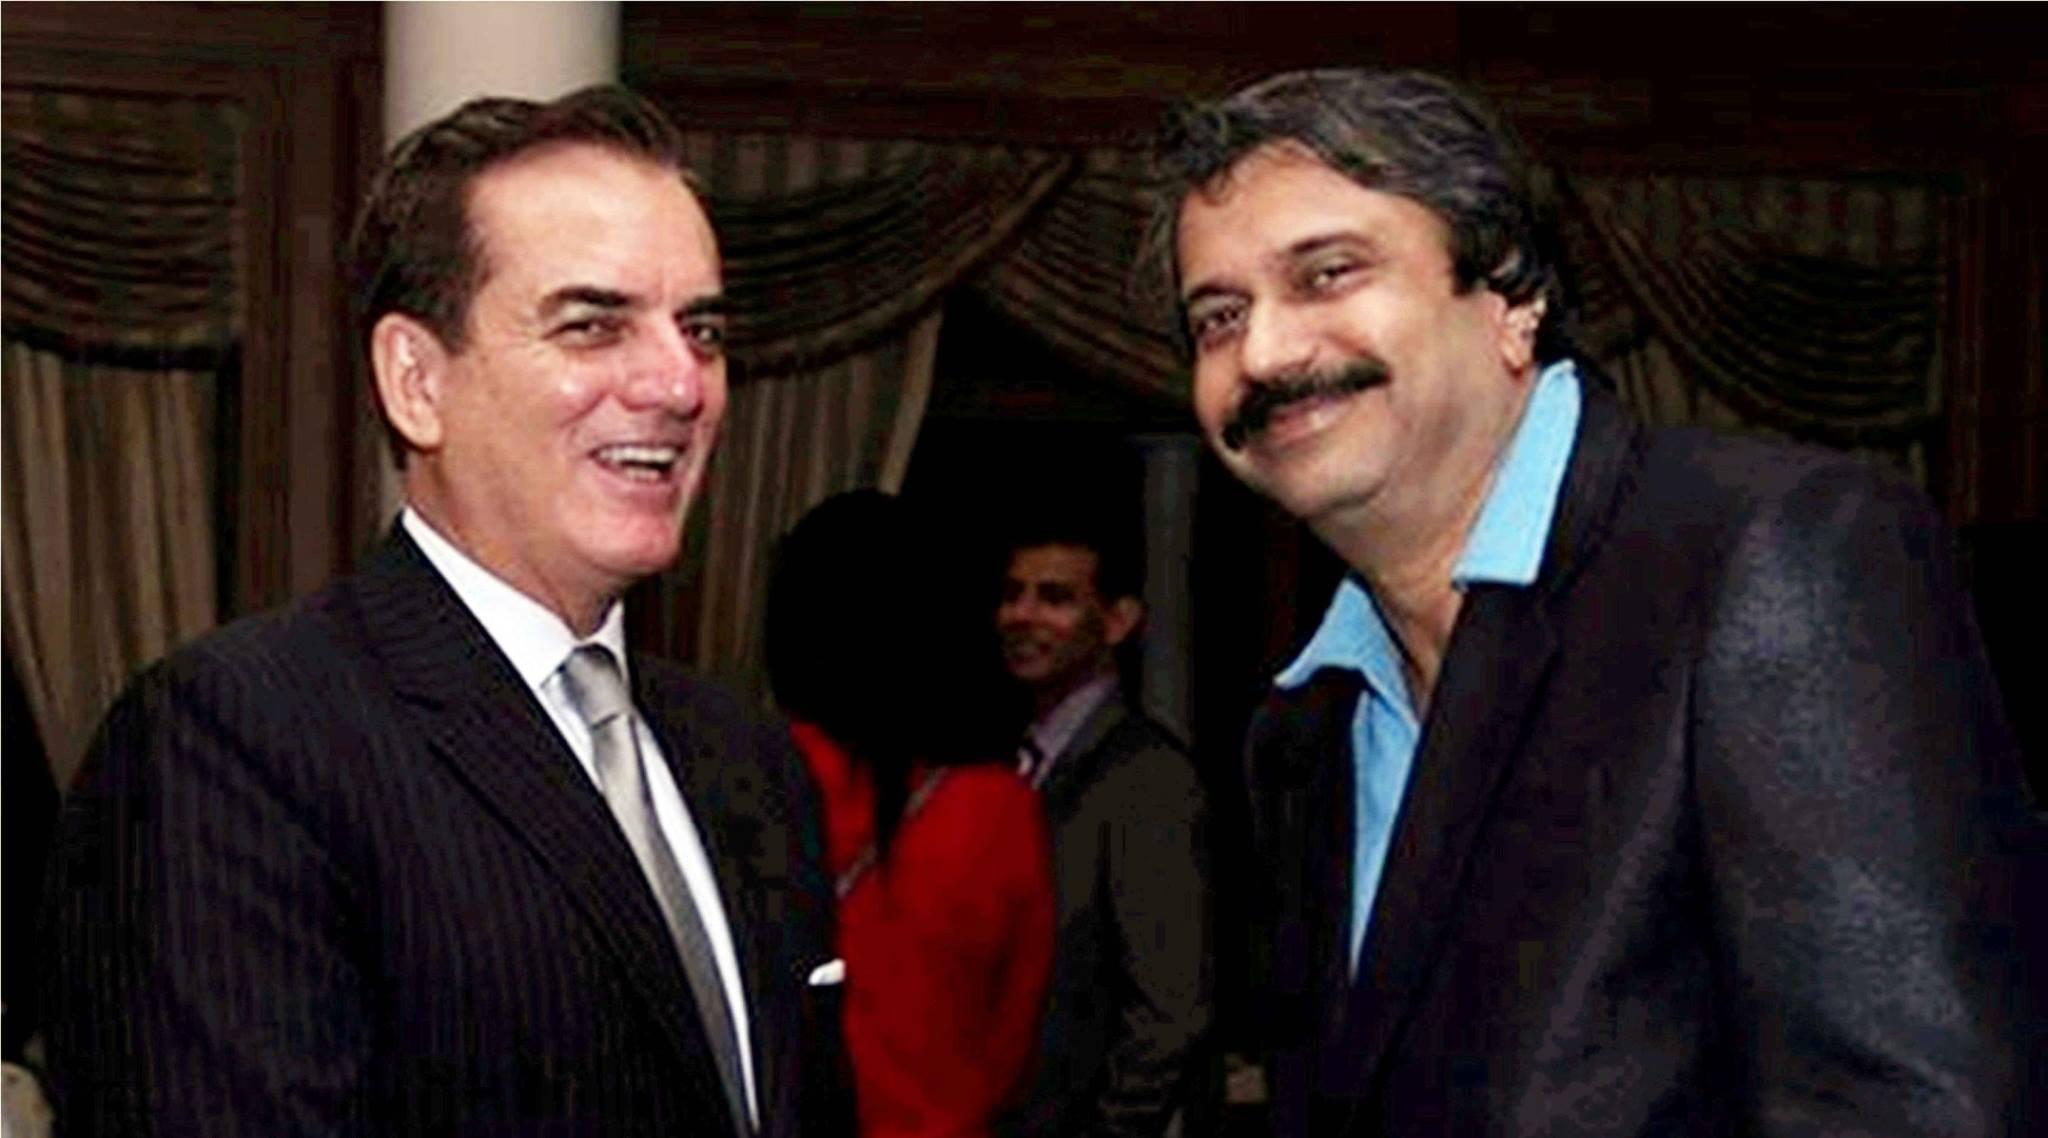 Ambassador of Brazil His Excellency Tovar da Silva Nunes complimenting Chaitanya Padukone (right) for the book R.D.BurMania – PanchaMemoirs.